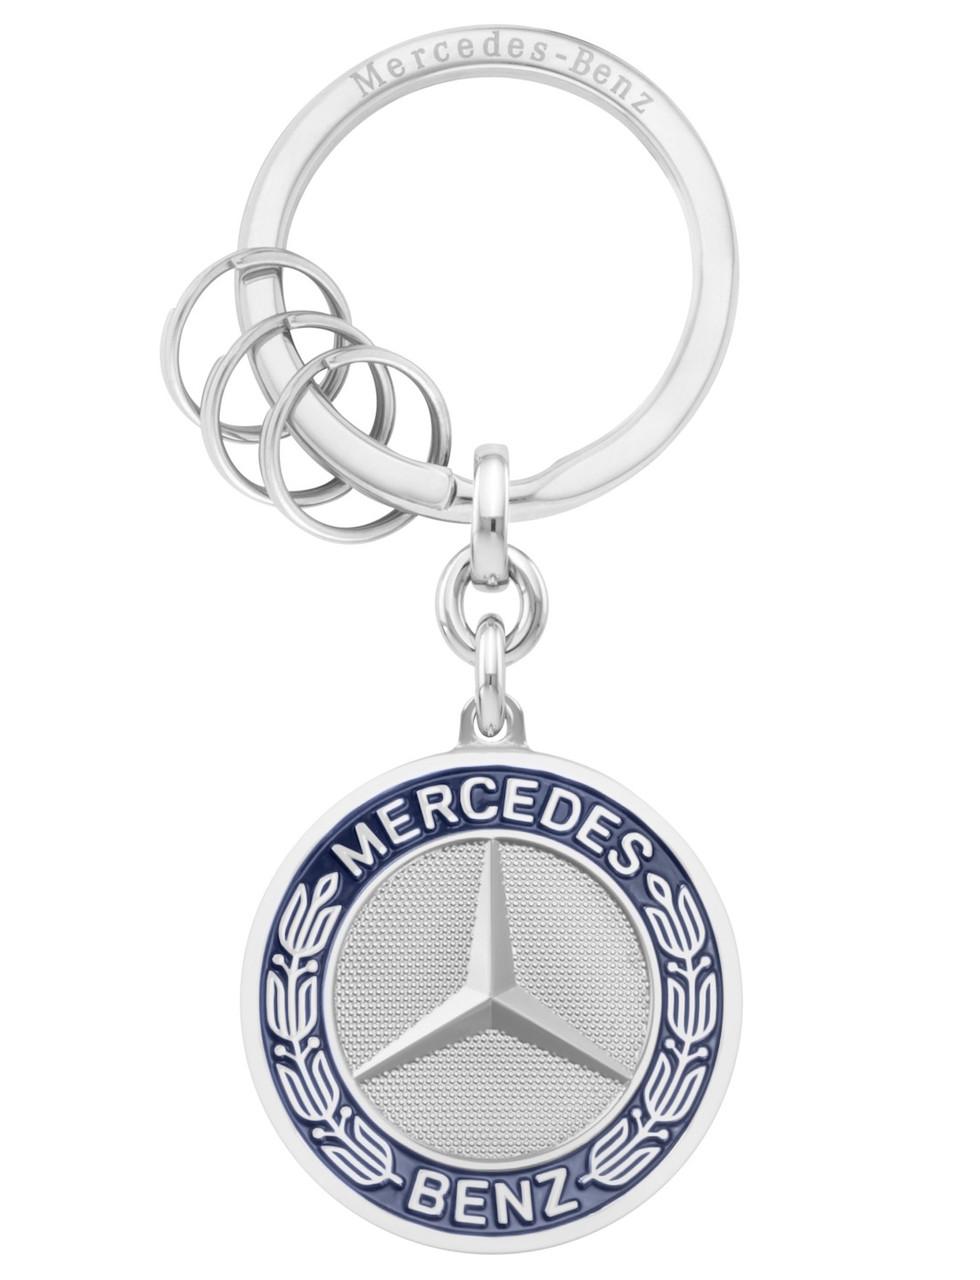 Брелок Mercedes-Benz Key Ring, Stuttgart, Silver, (B66041524)